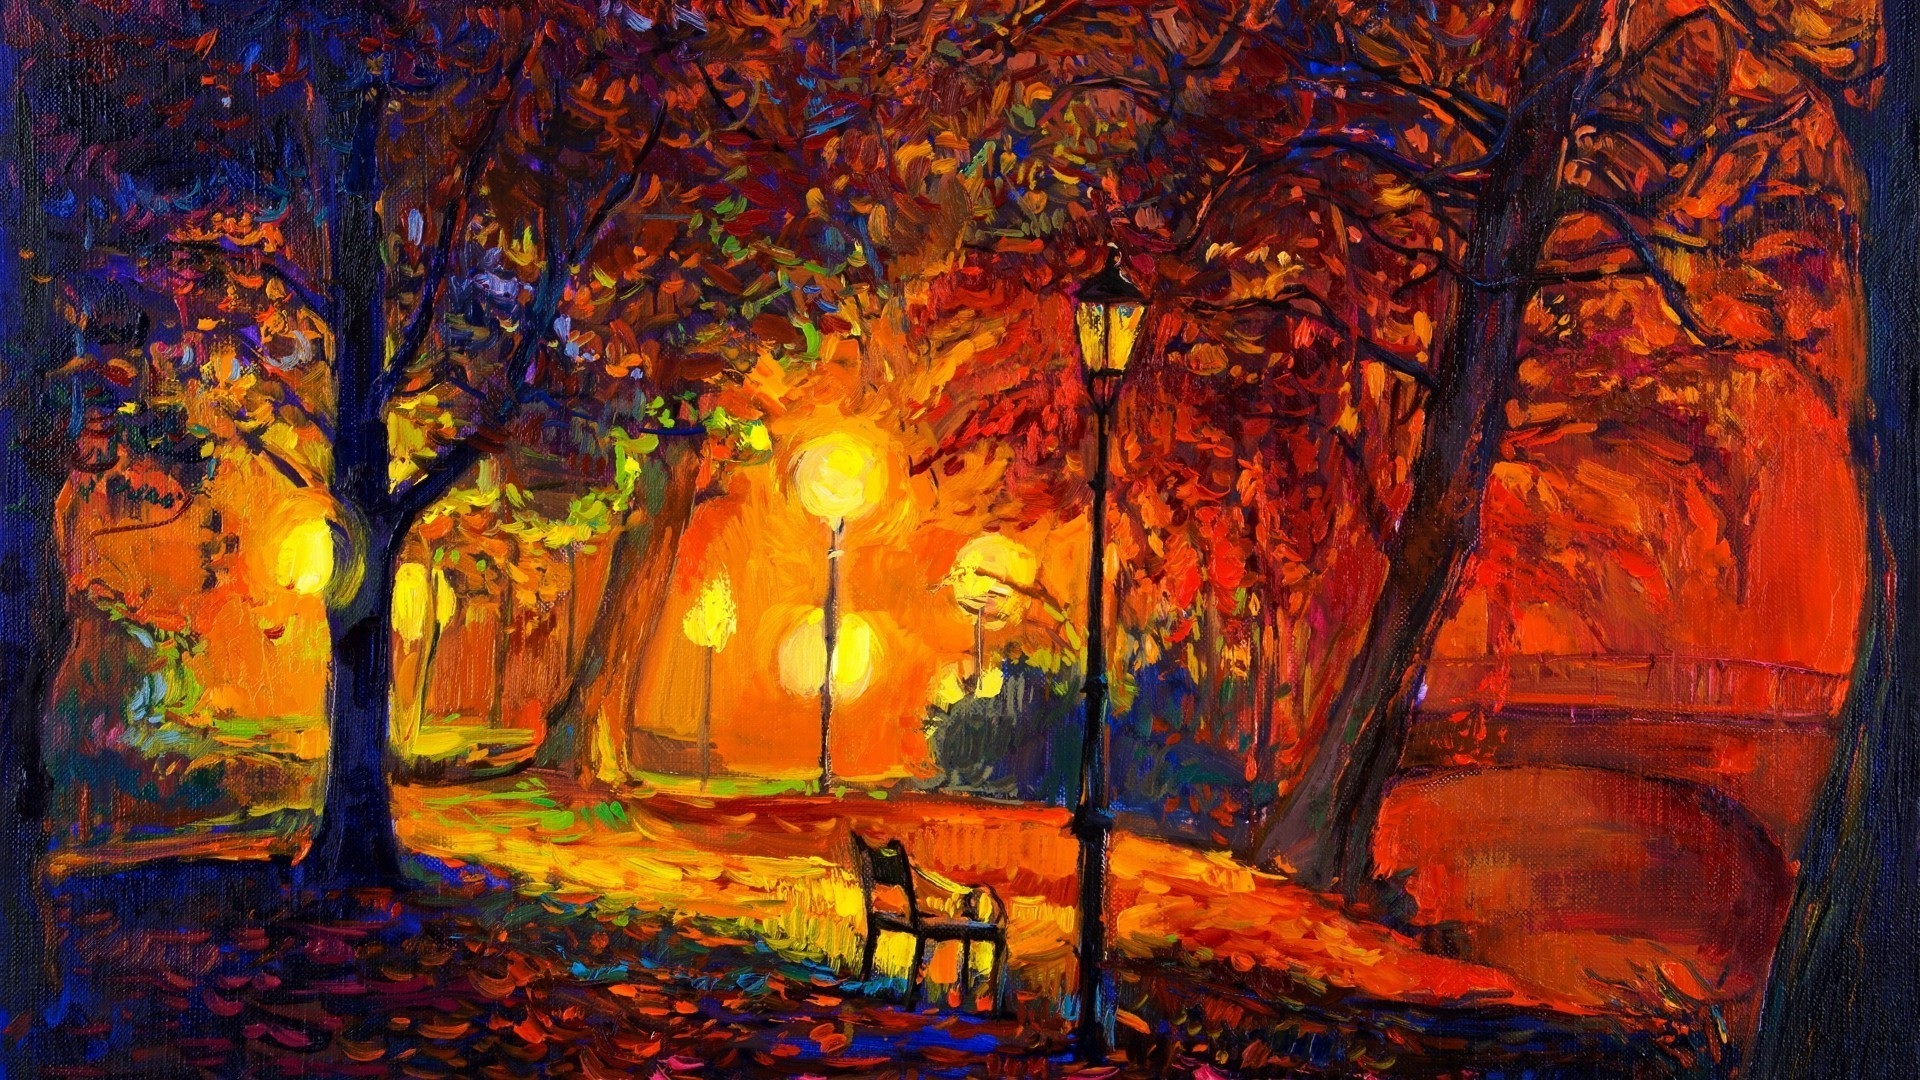 Wallpapersafari: Impressionist Backgrounds ·①